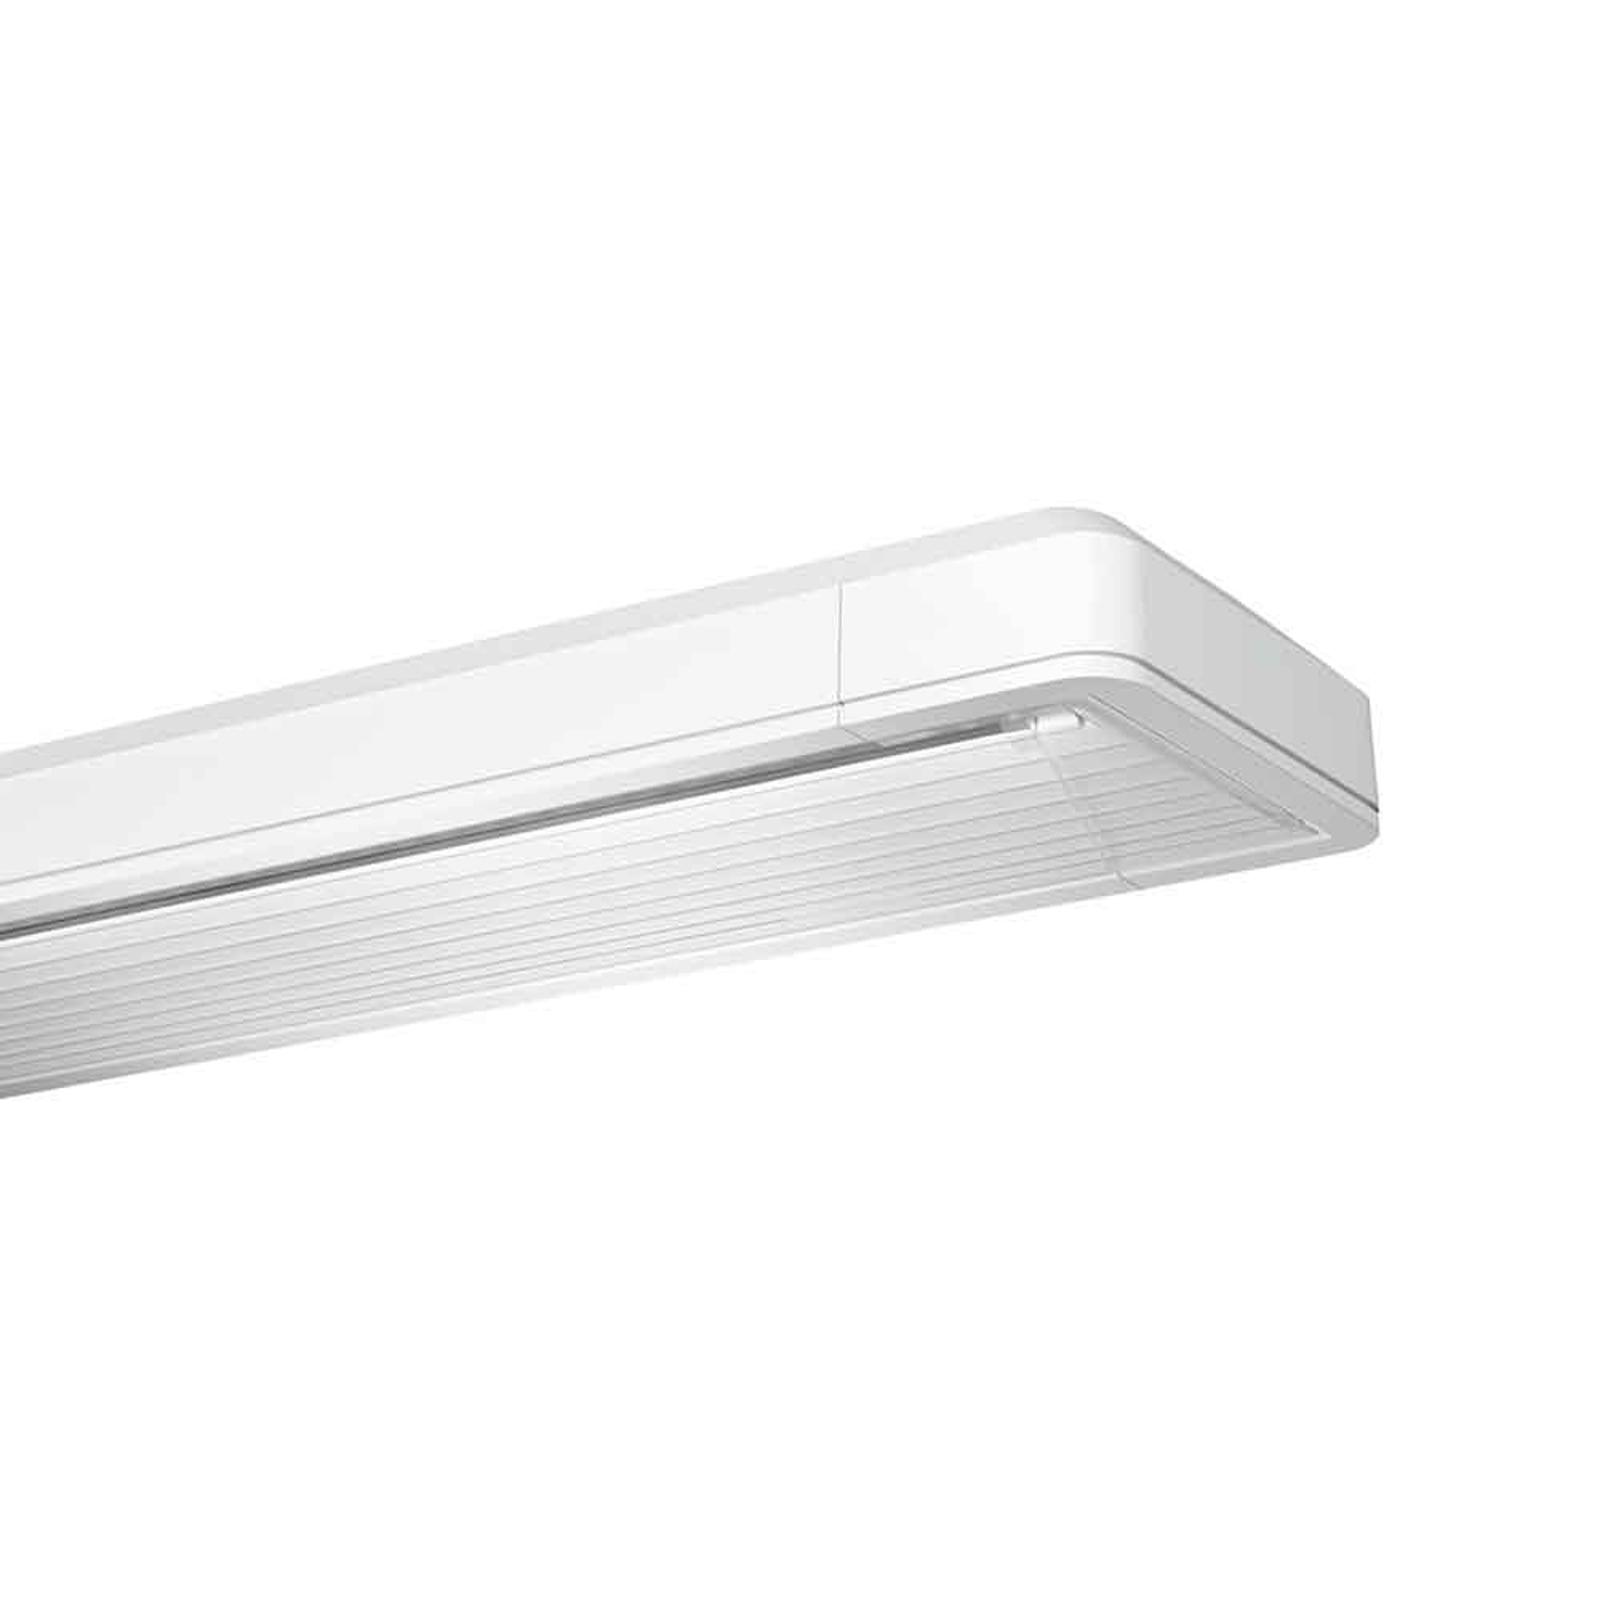 Siteco Taris LED plafondlamp 151cm EVG